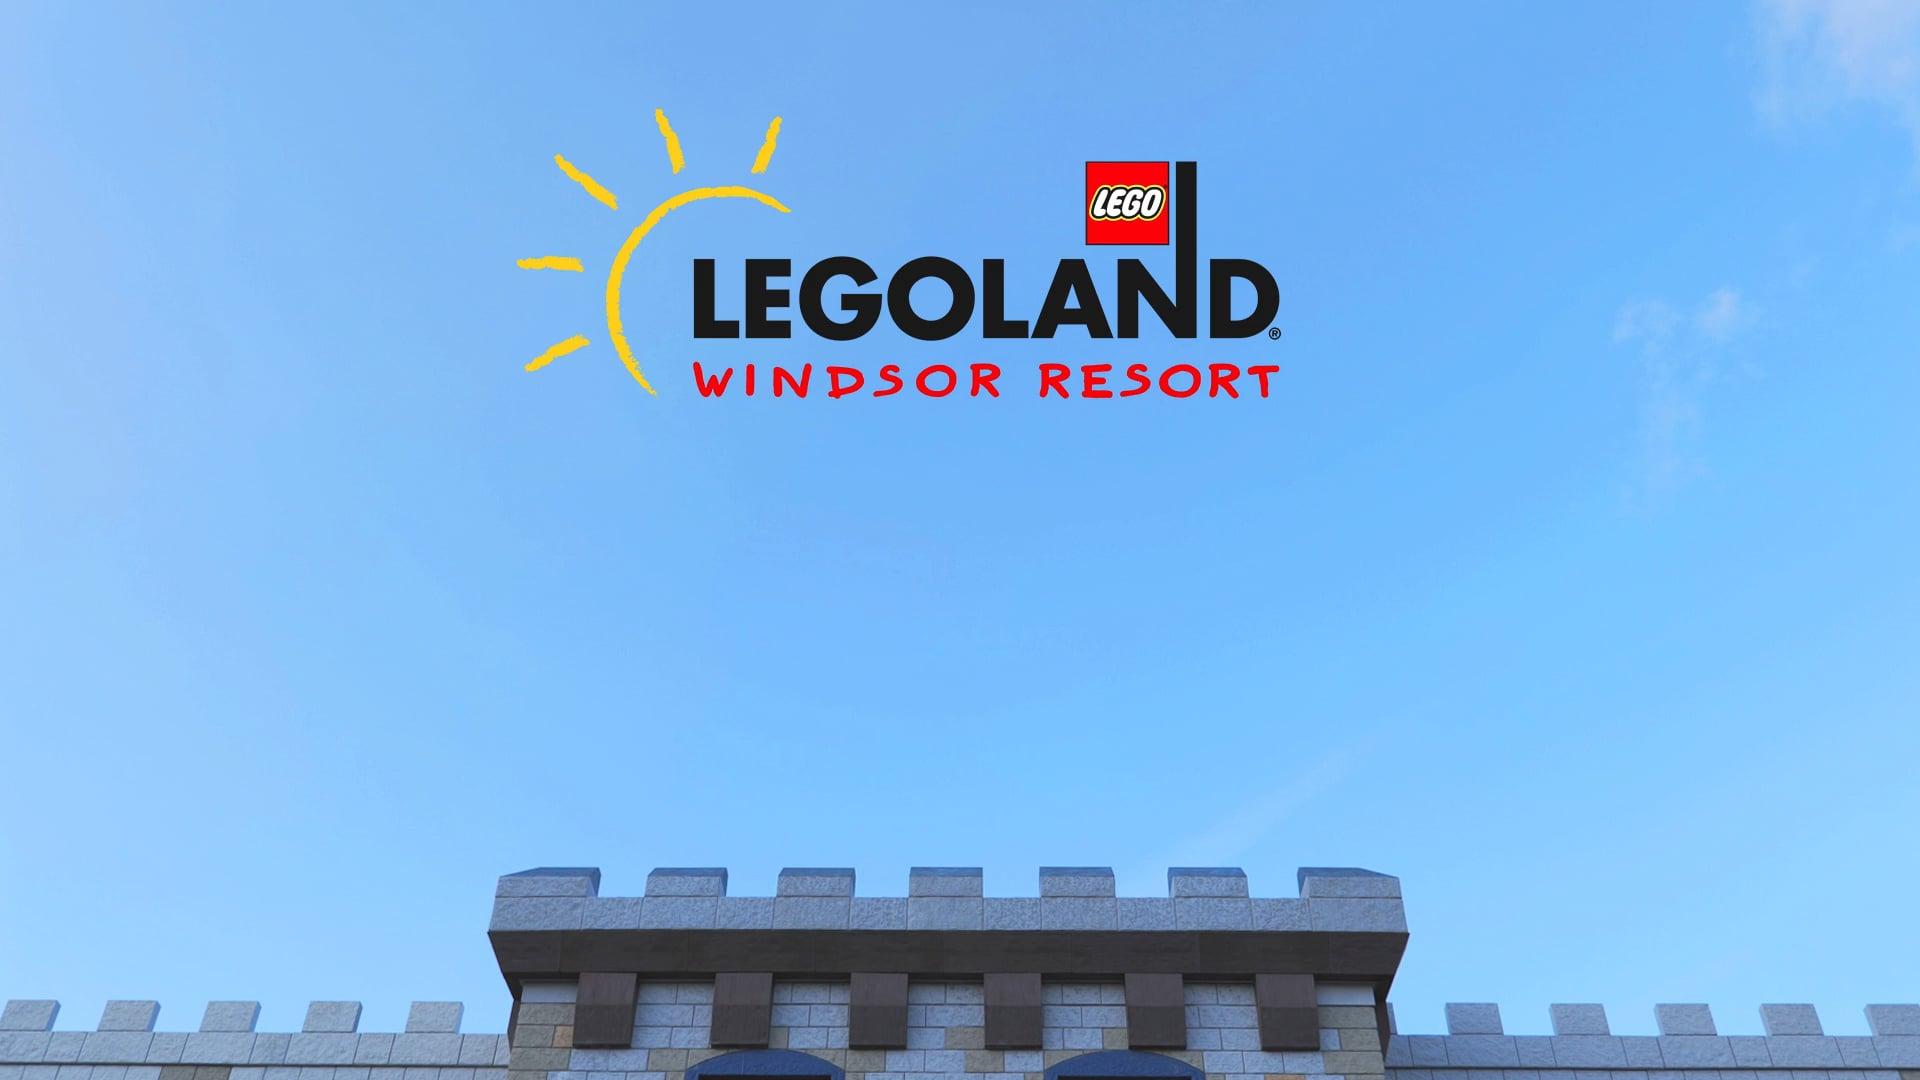 Legoland TVC